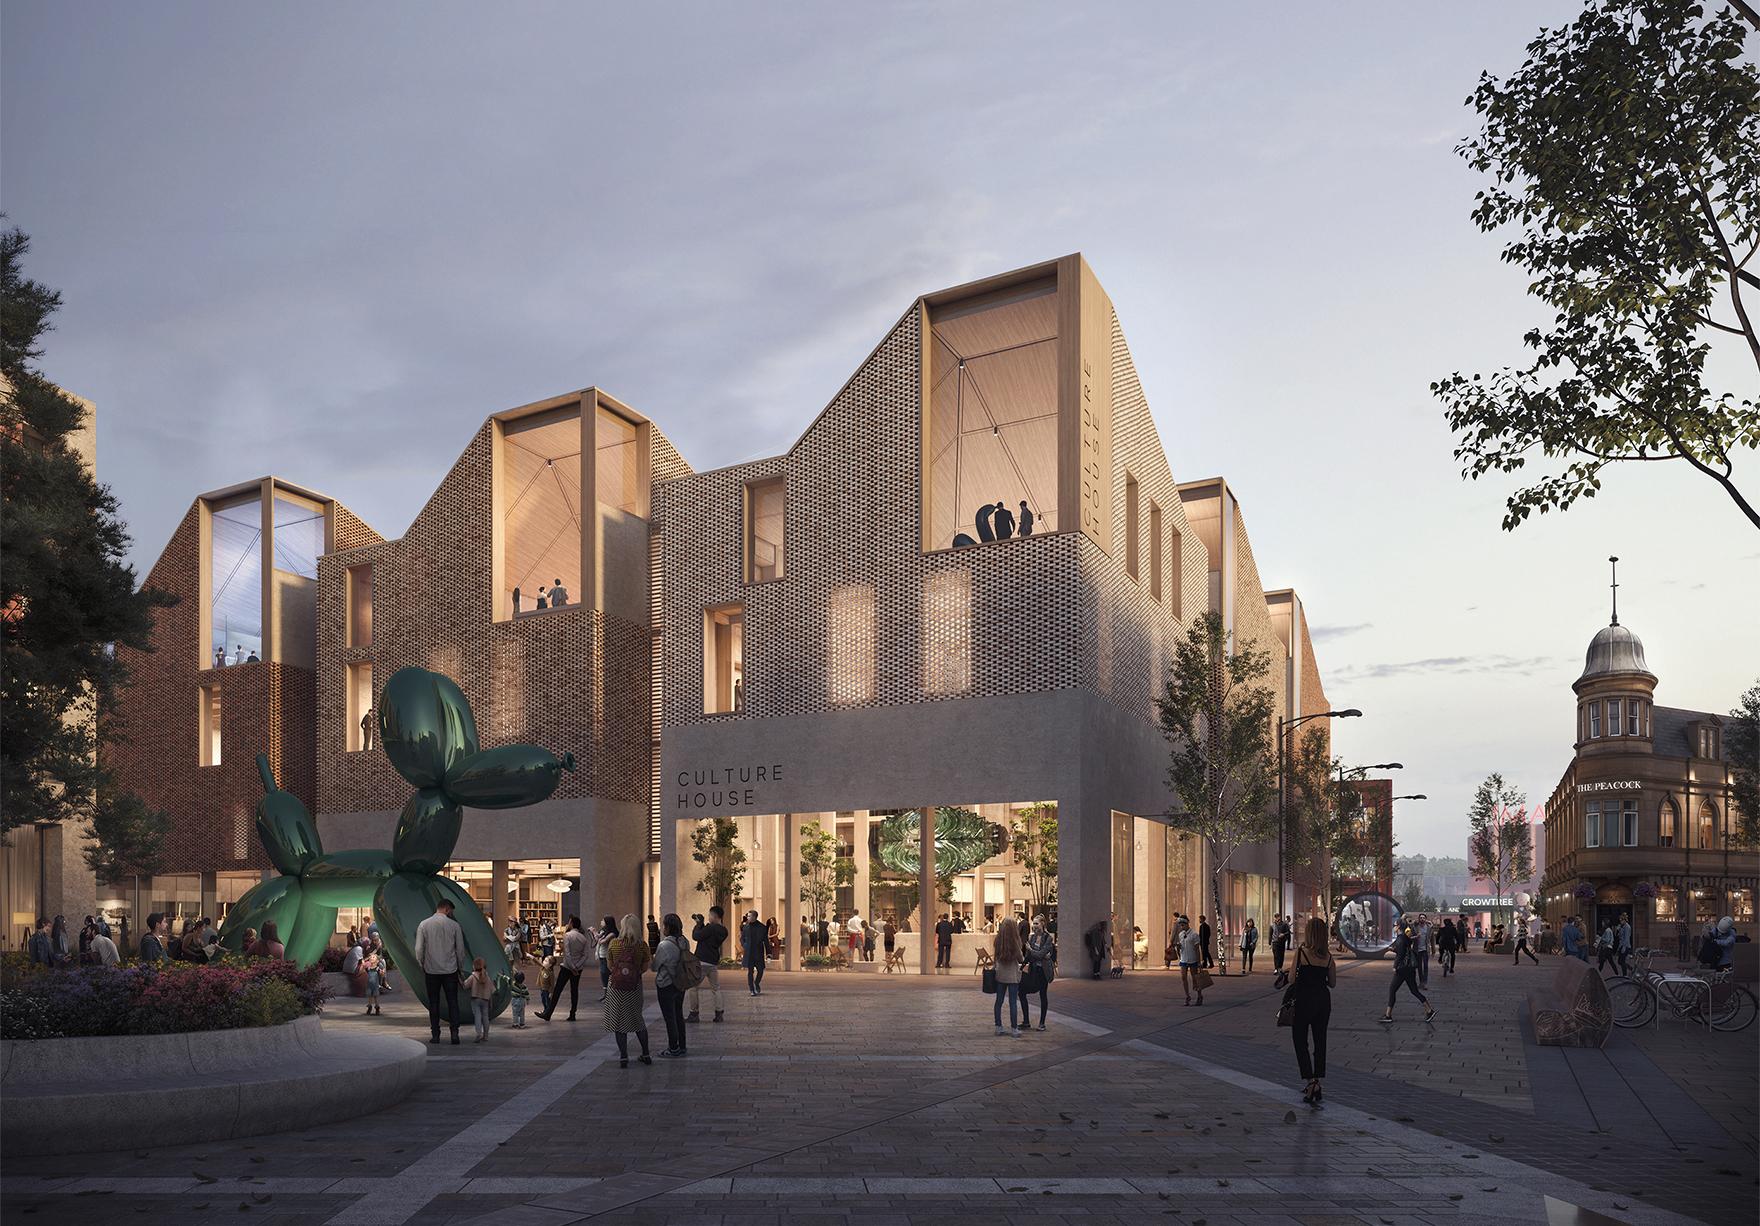 Riverside Sunderland Masterplan Faulknerbrowns Architects Culture House Render Lh